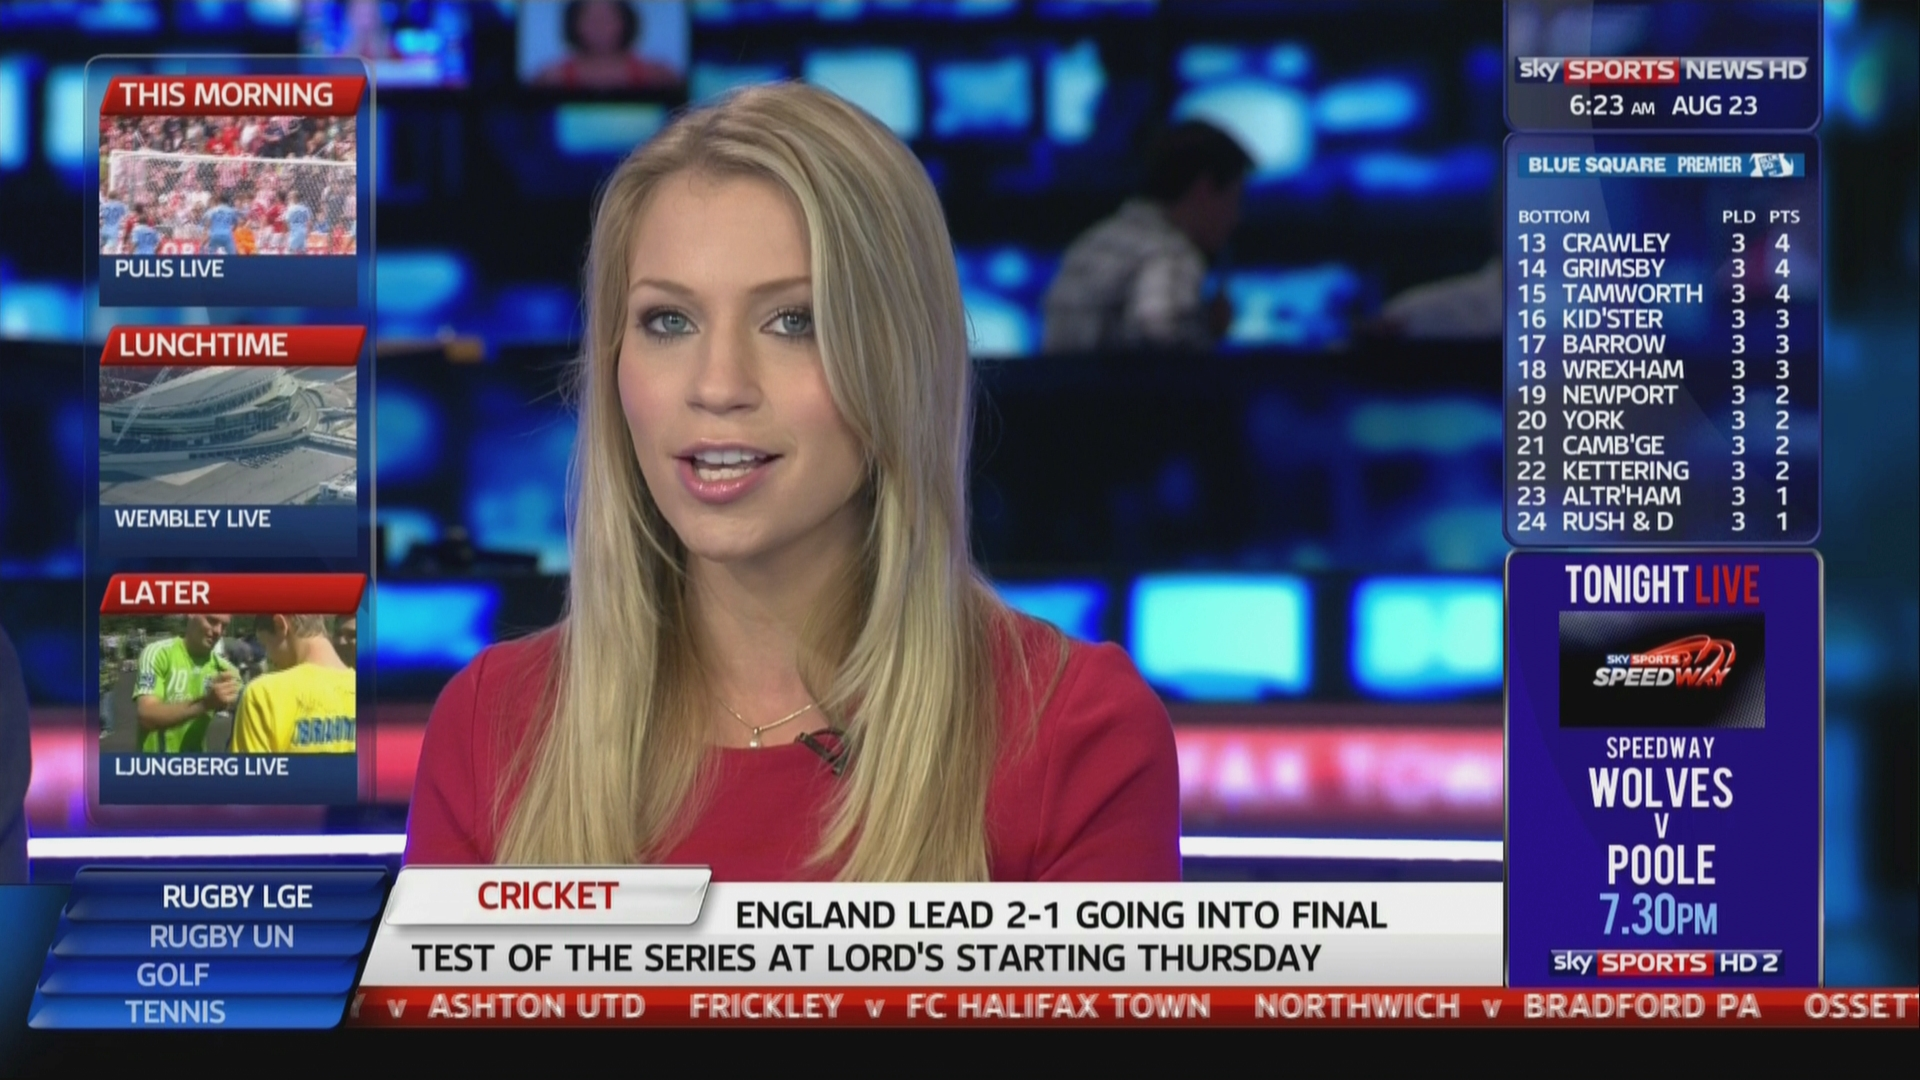 Sky news sport